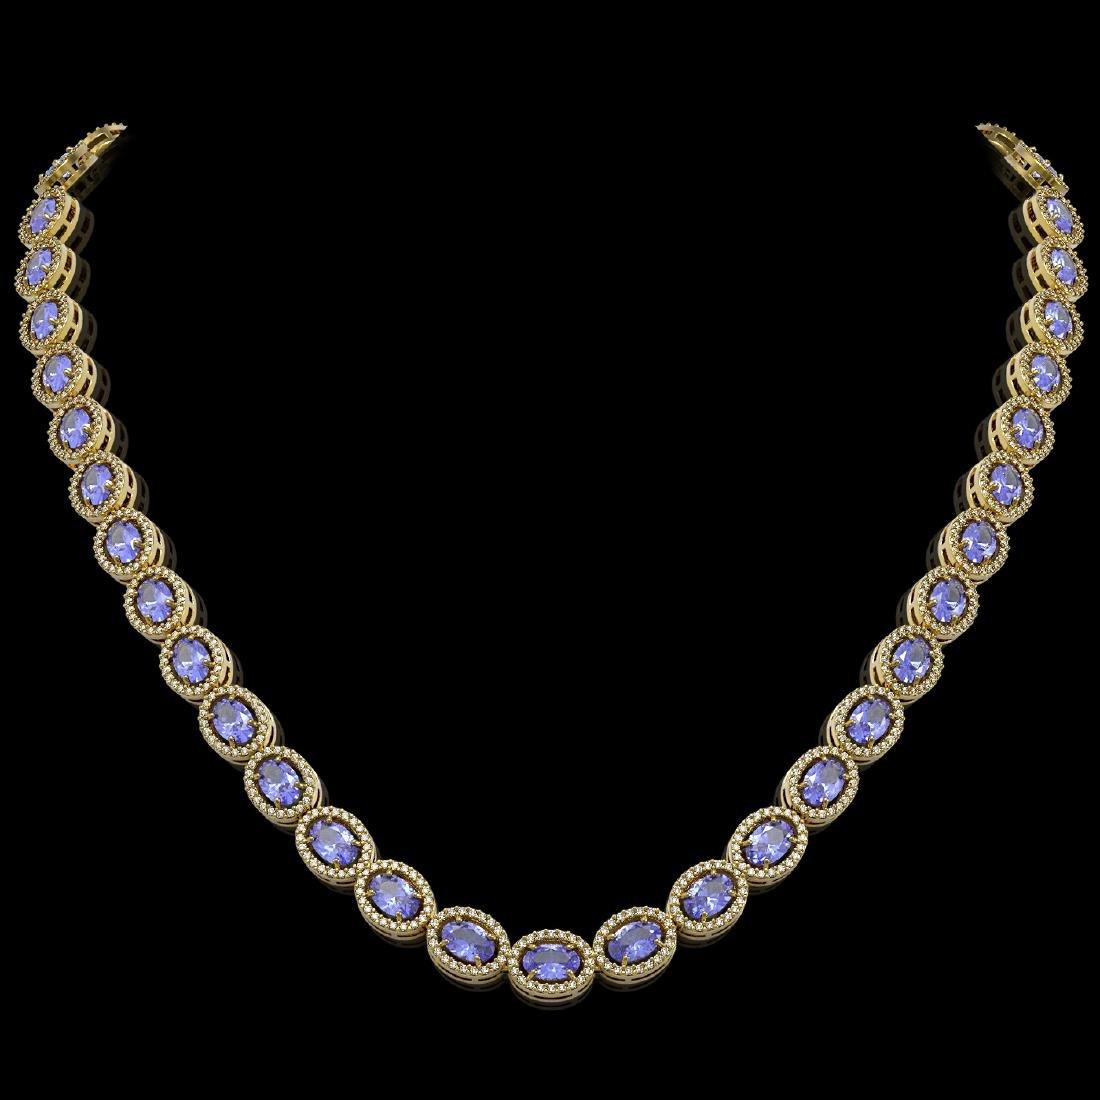 31.96 CTW Tanzanite & Diamond Halo Necklace 10K Yellow